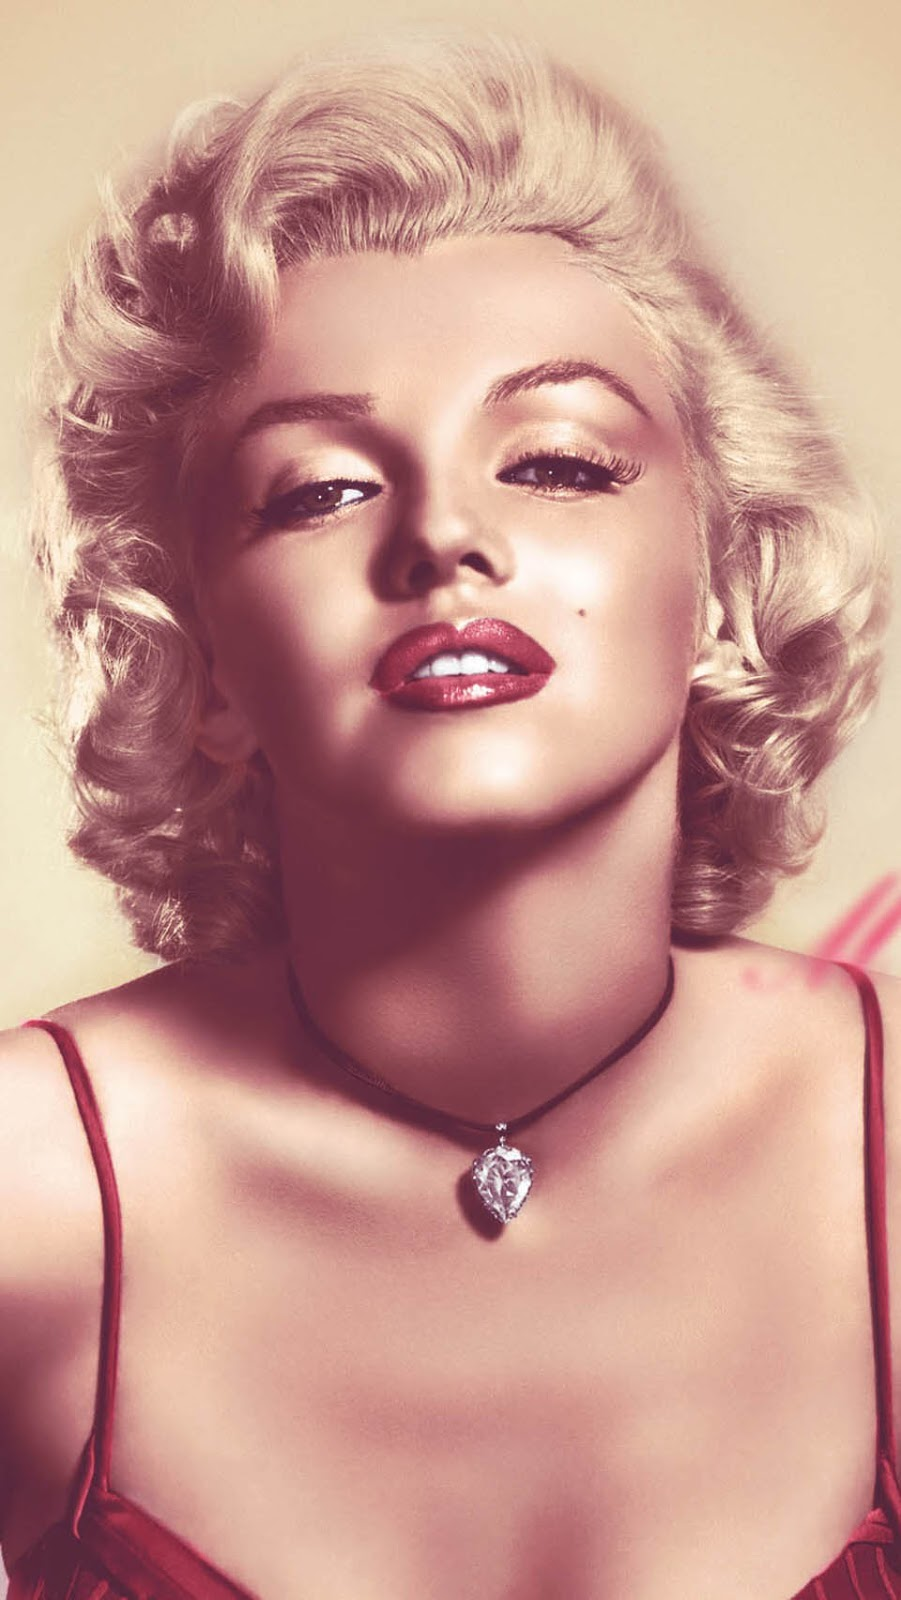 Celebrities Iphone Wallpapers Marilyn Monroe Iphone Wallpapers